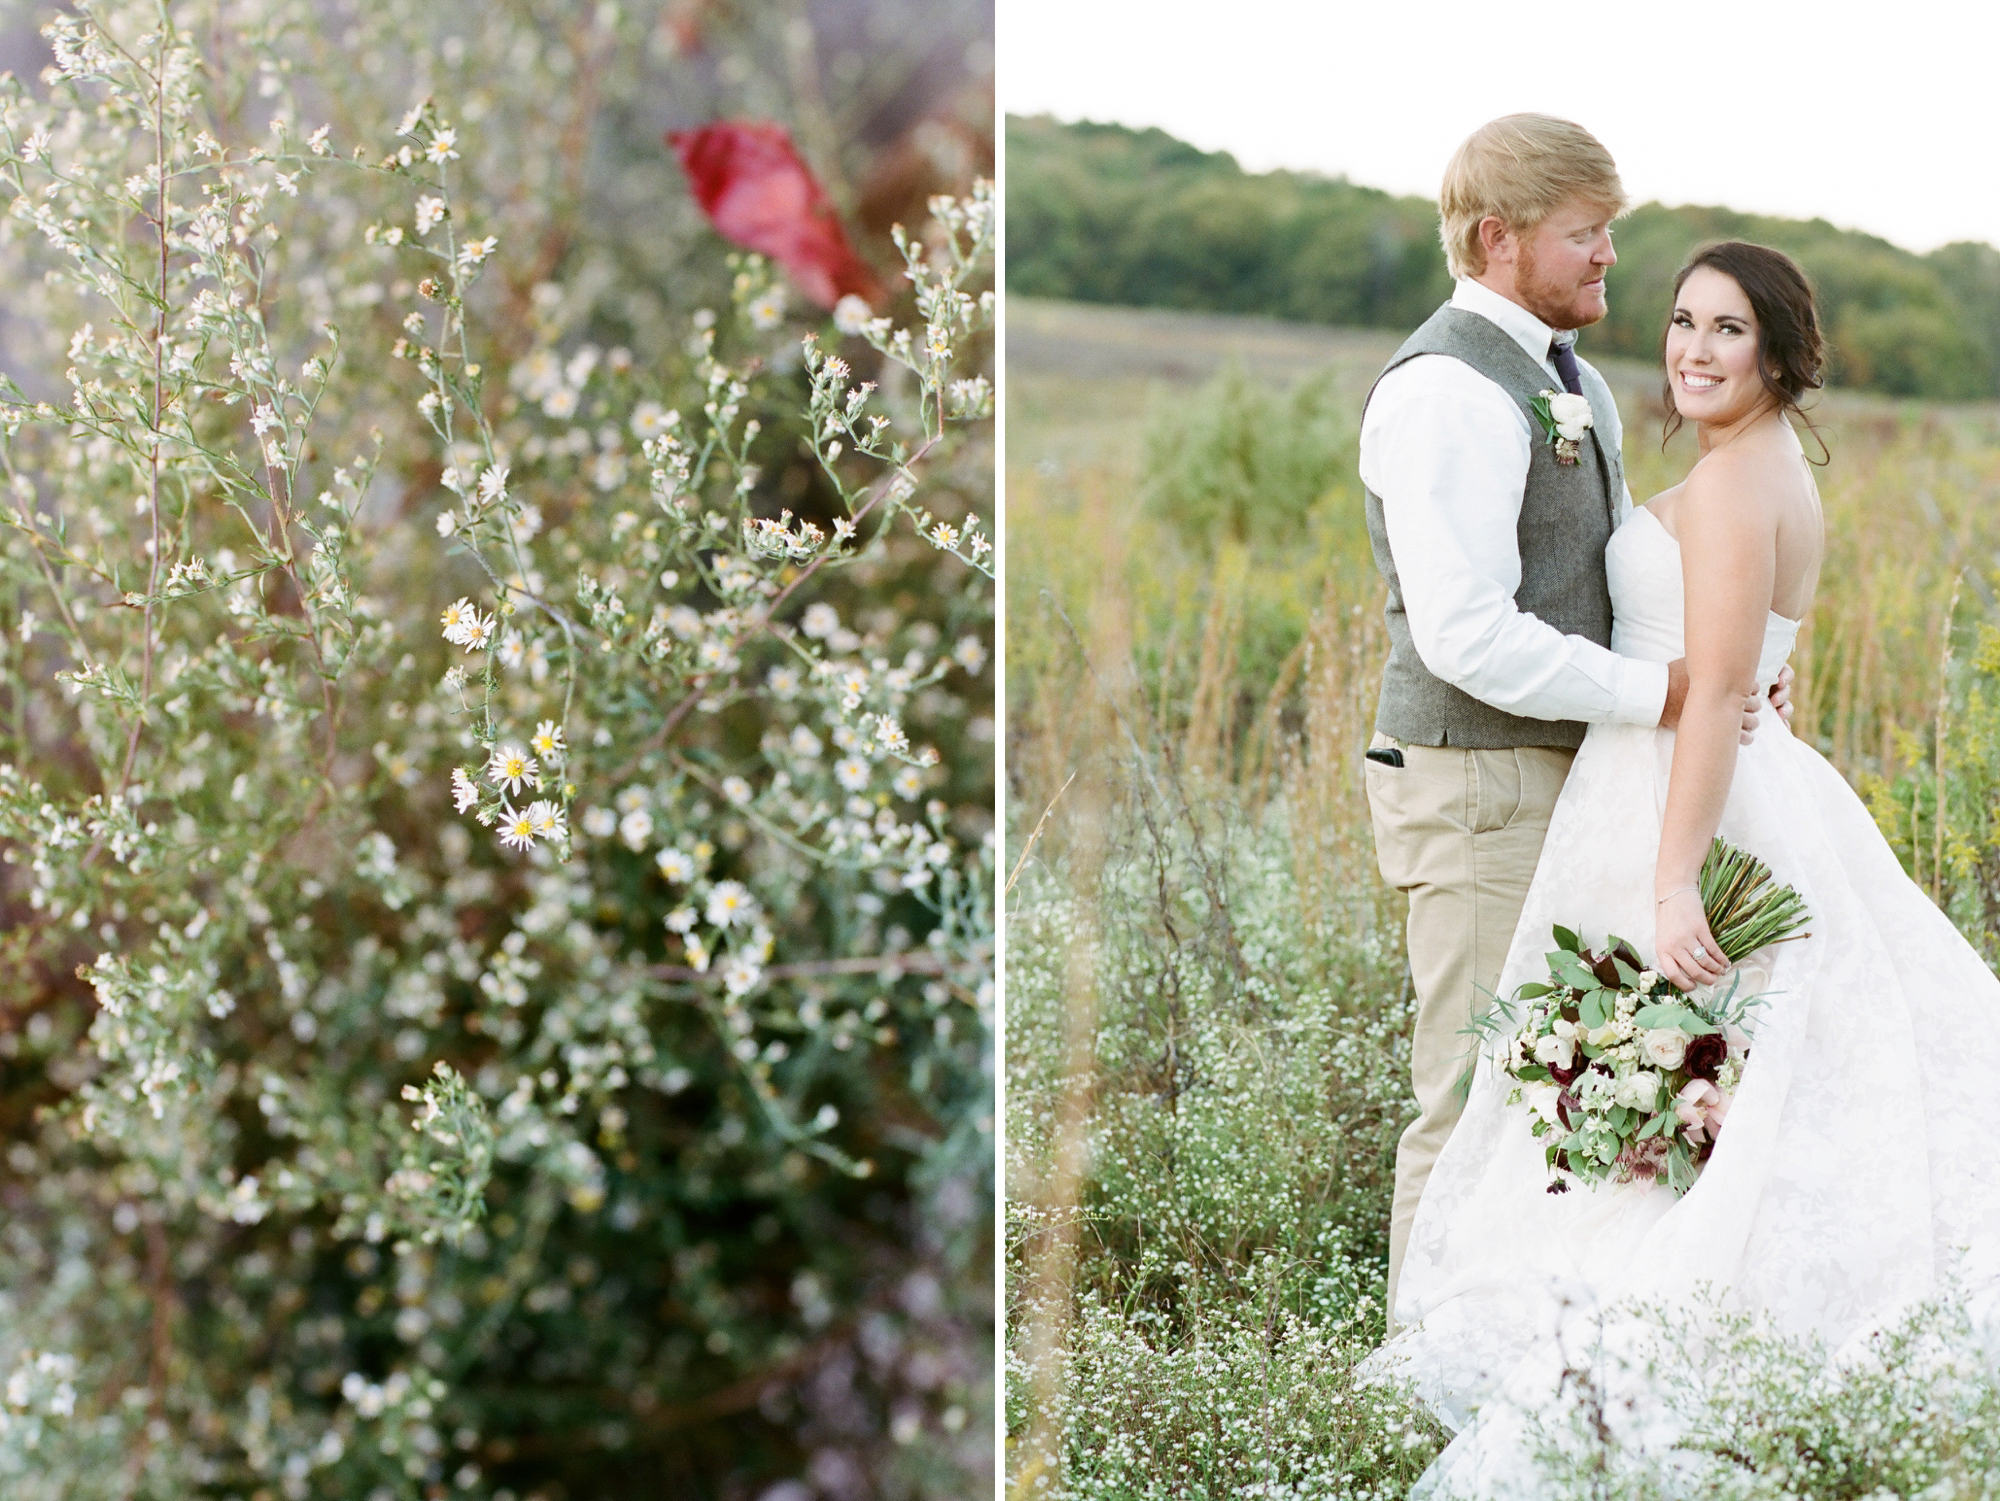 southern-weddings-film-photographer_0051.jpg